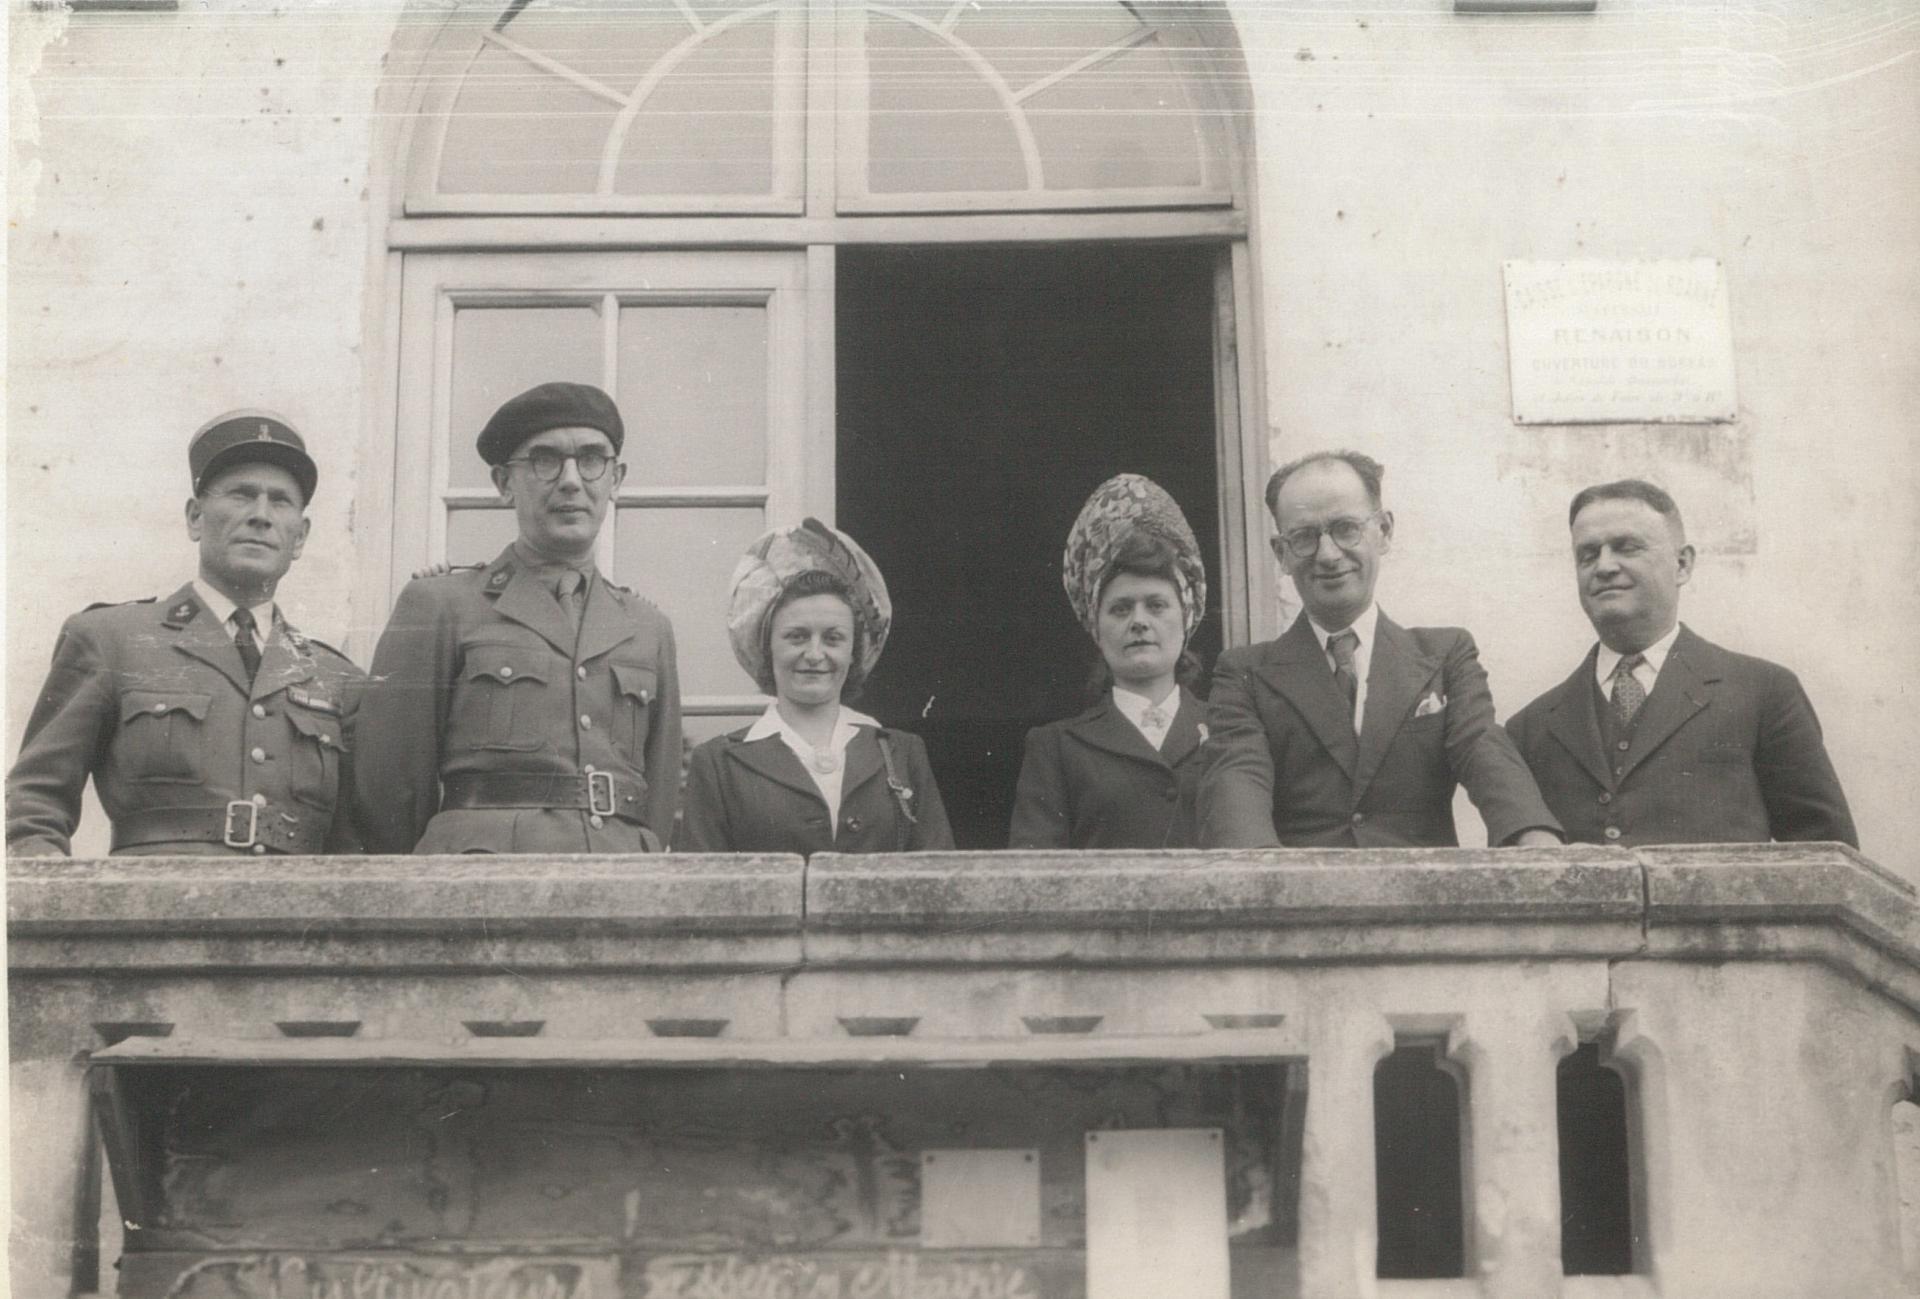 22 Aout 1944